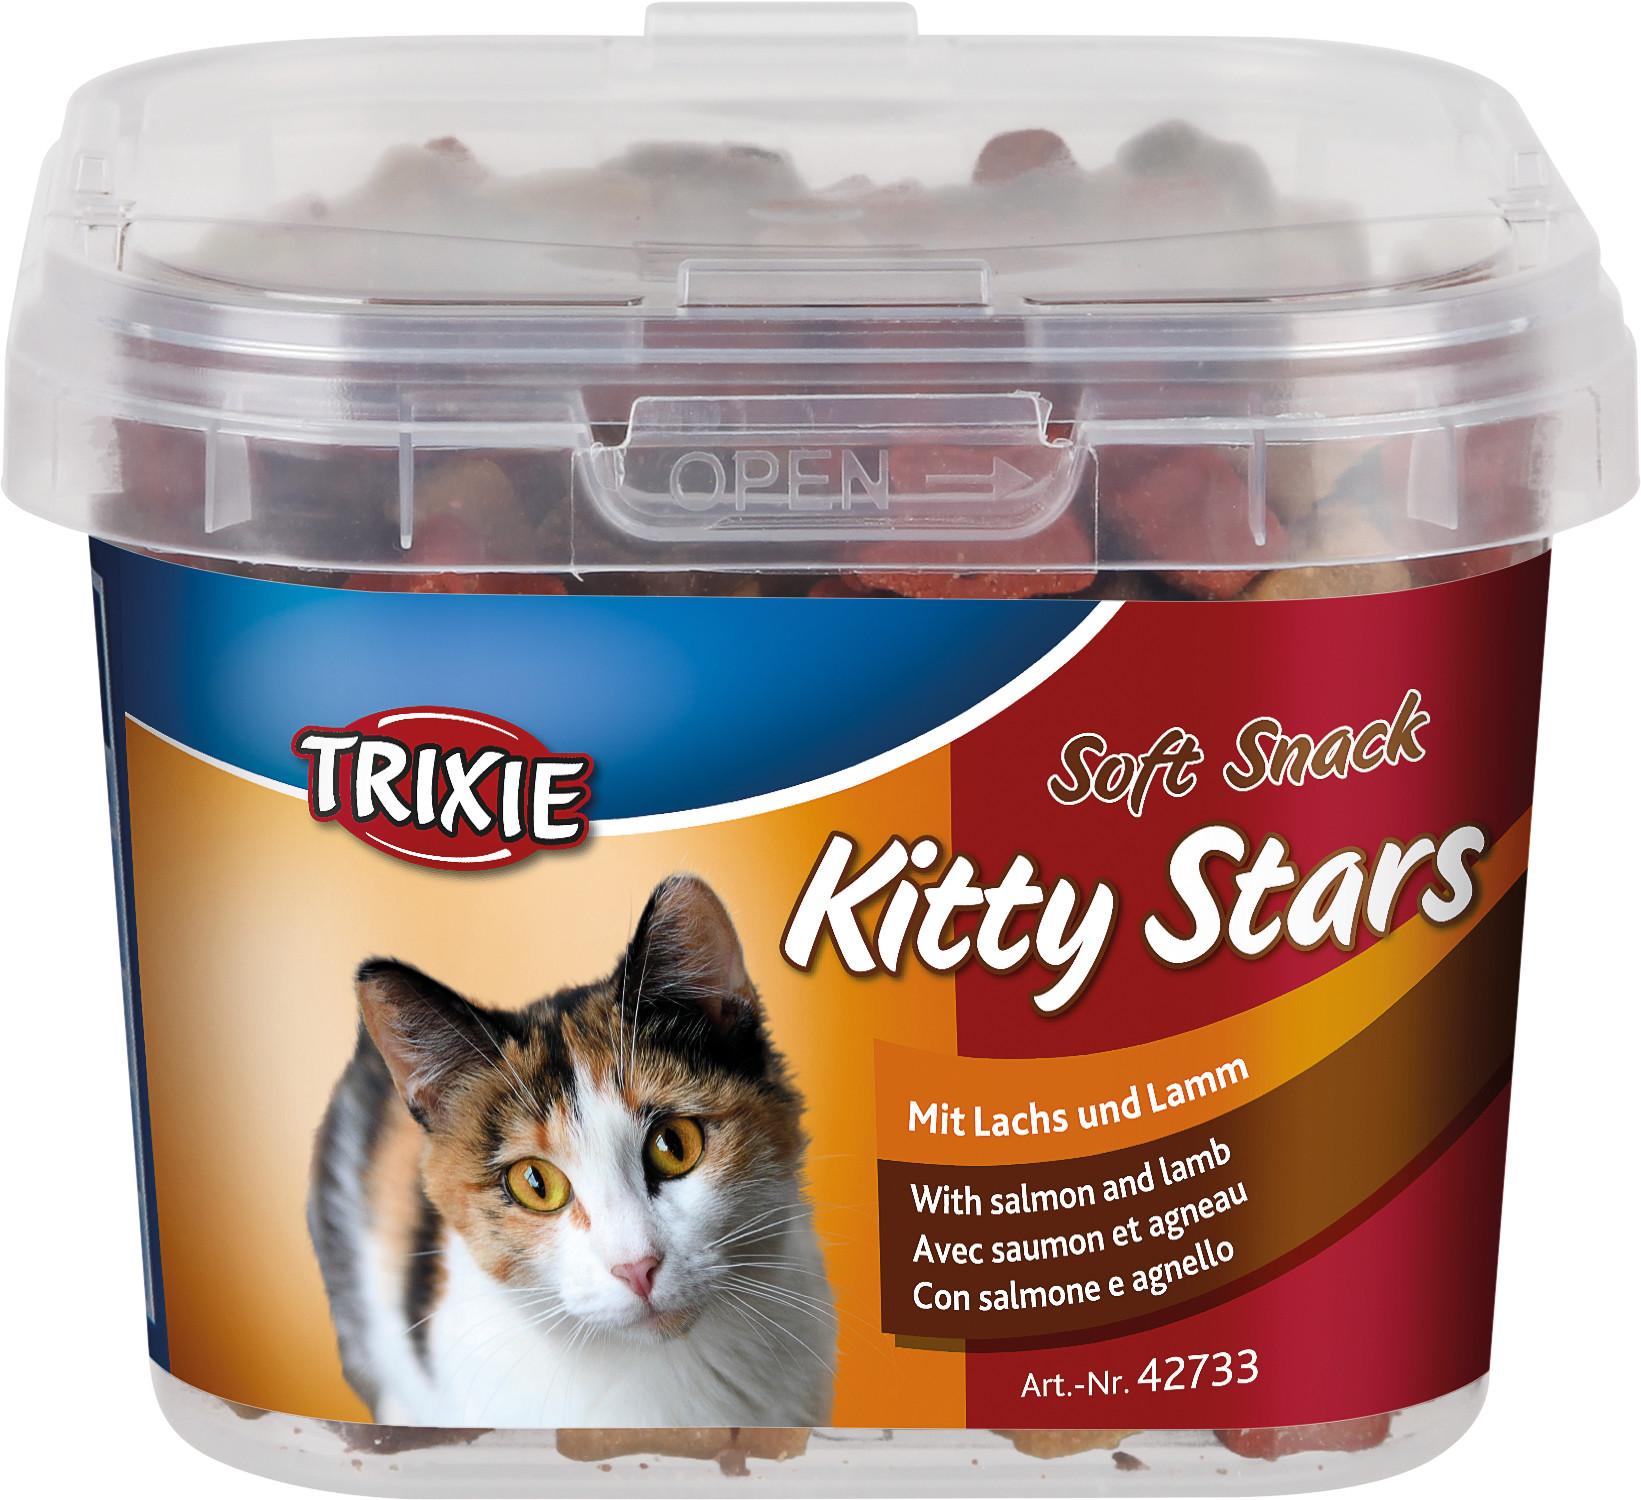 TRIXIE Soft Snack Kitty Stars, 140 g